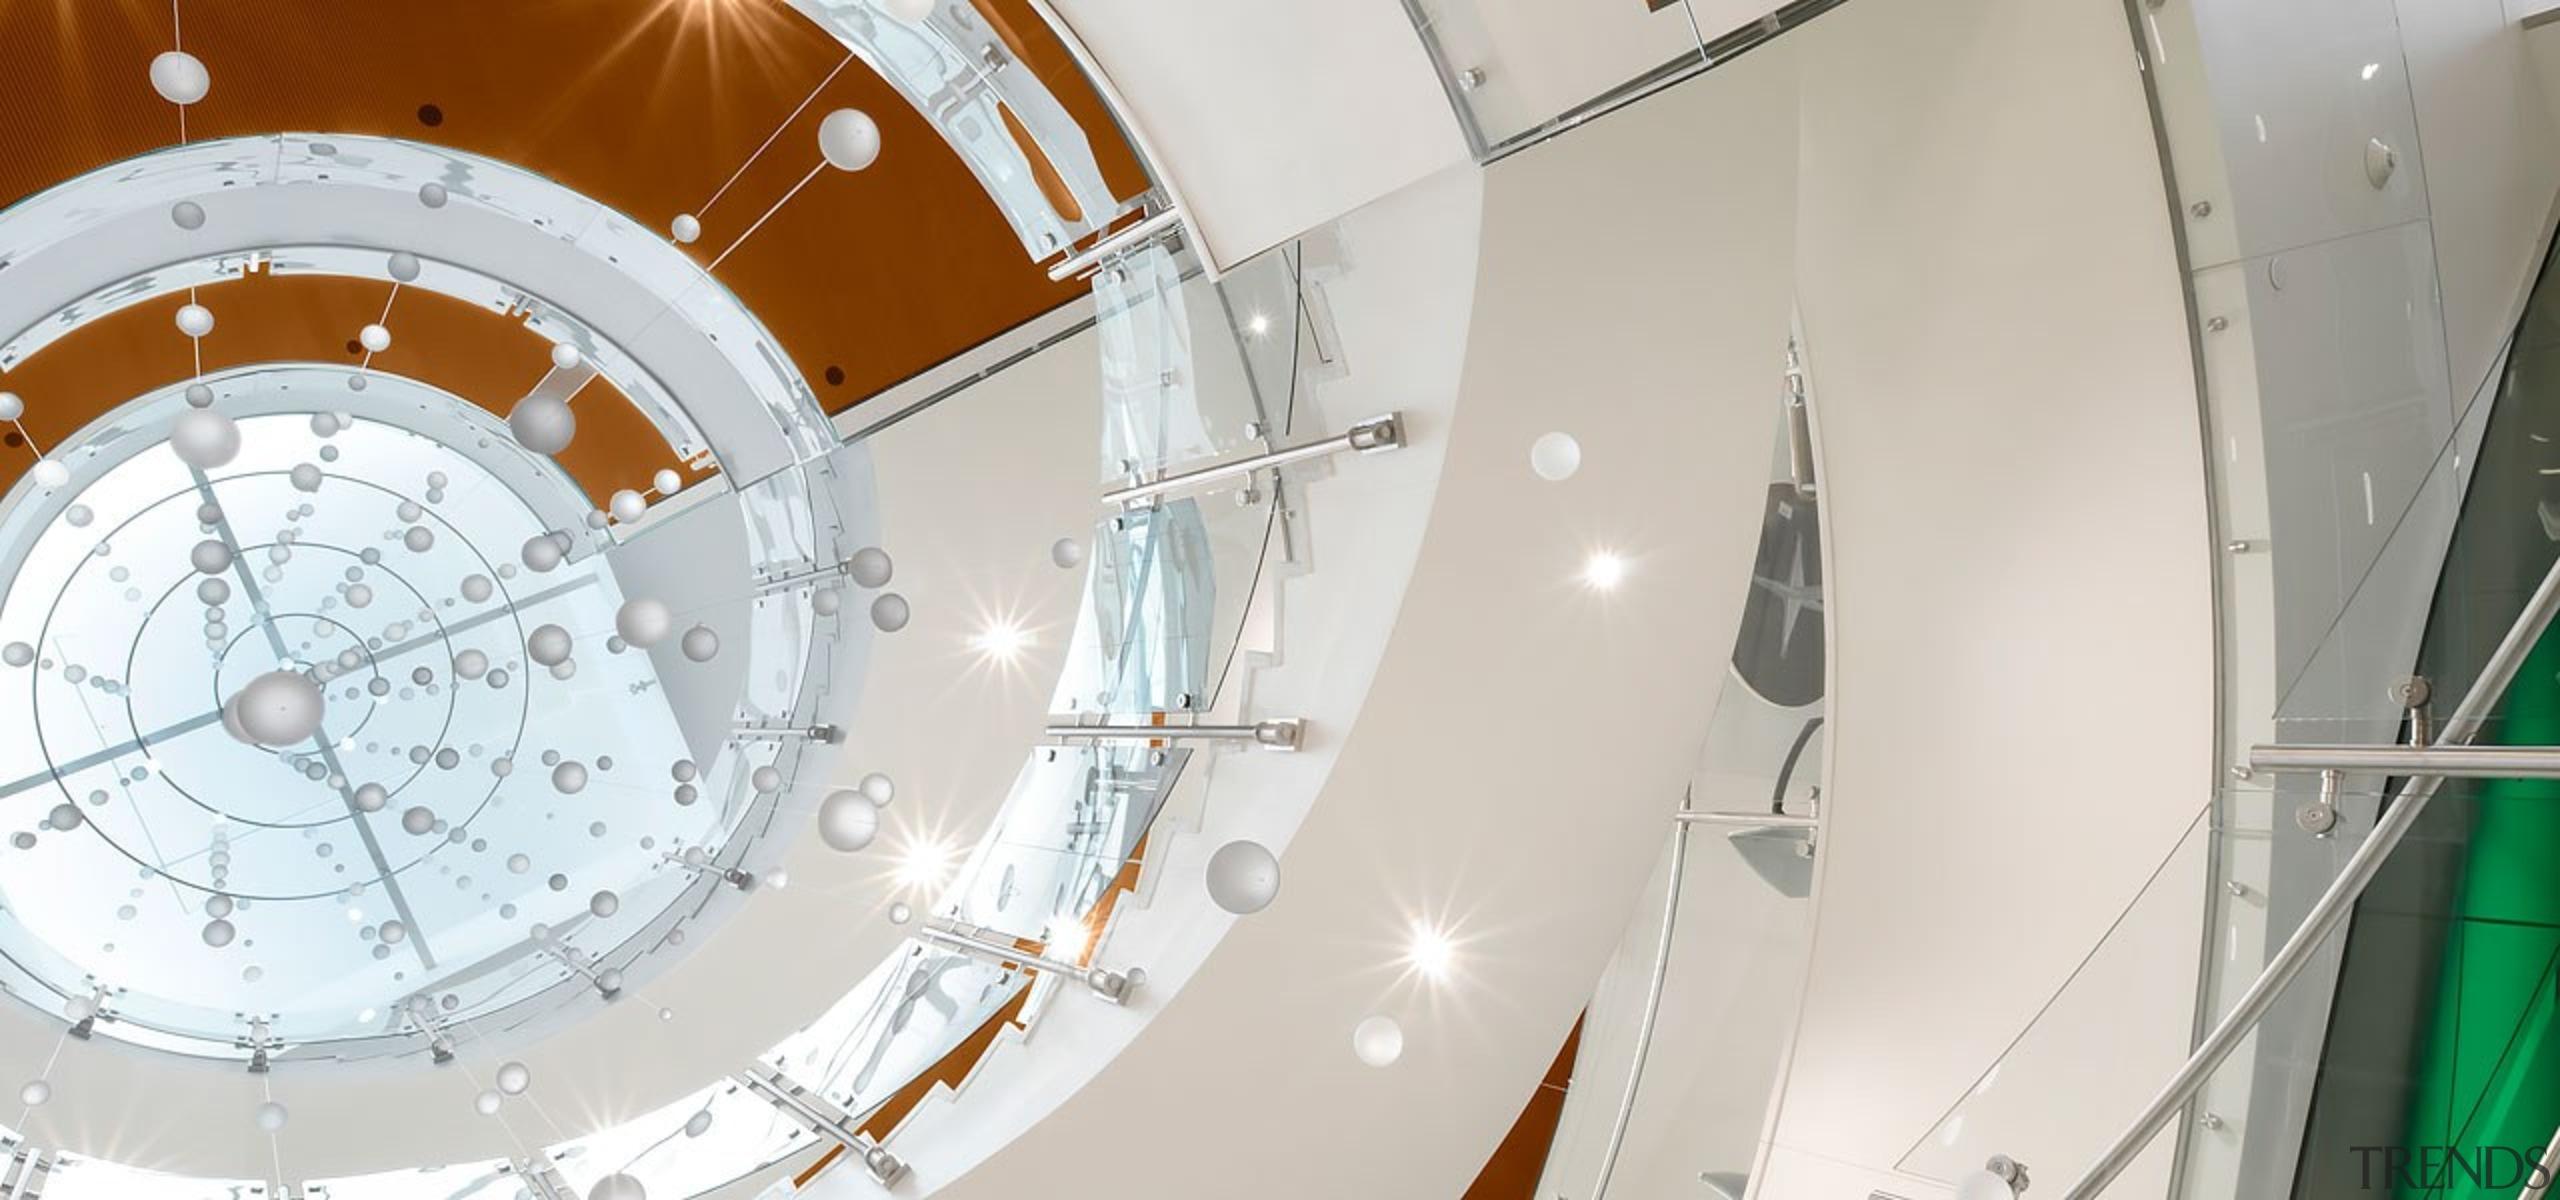 Colorado State University2 - architecture   ceiling   architecture, ceiling, circle, daylighting, stairs, white, white